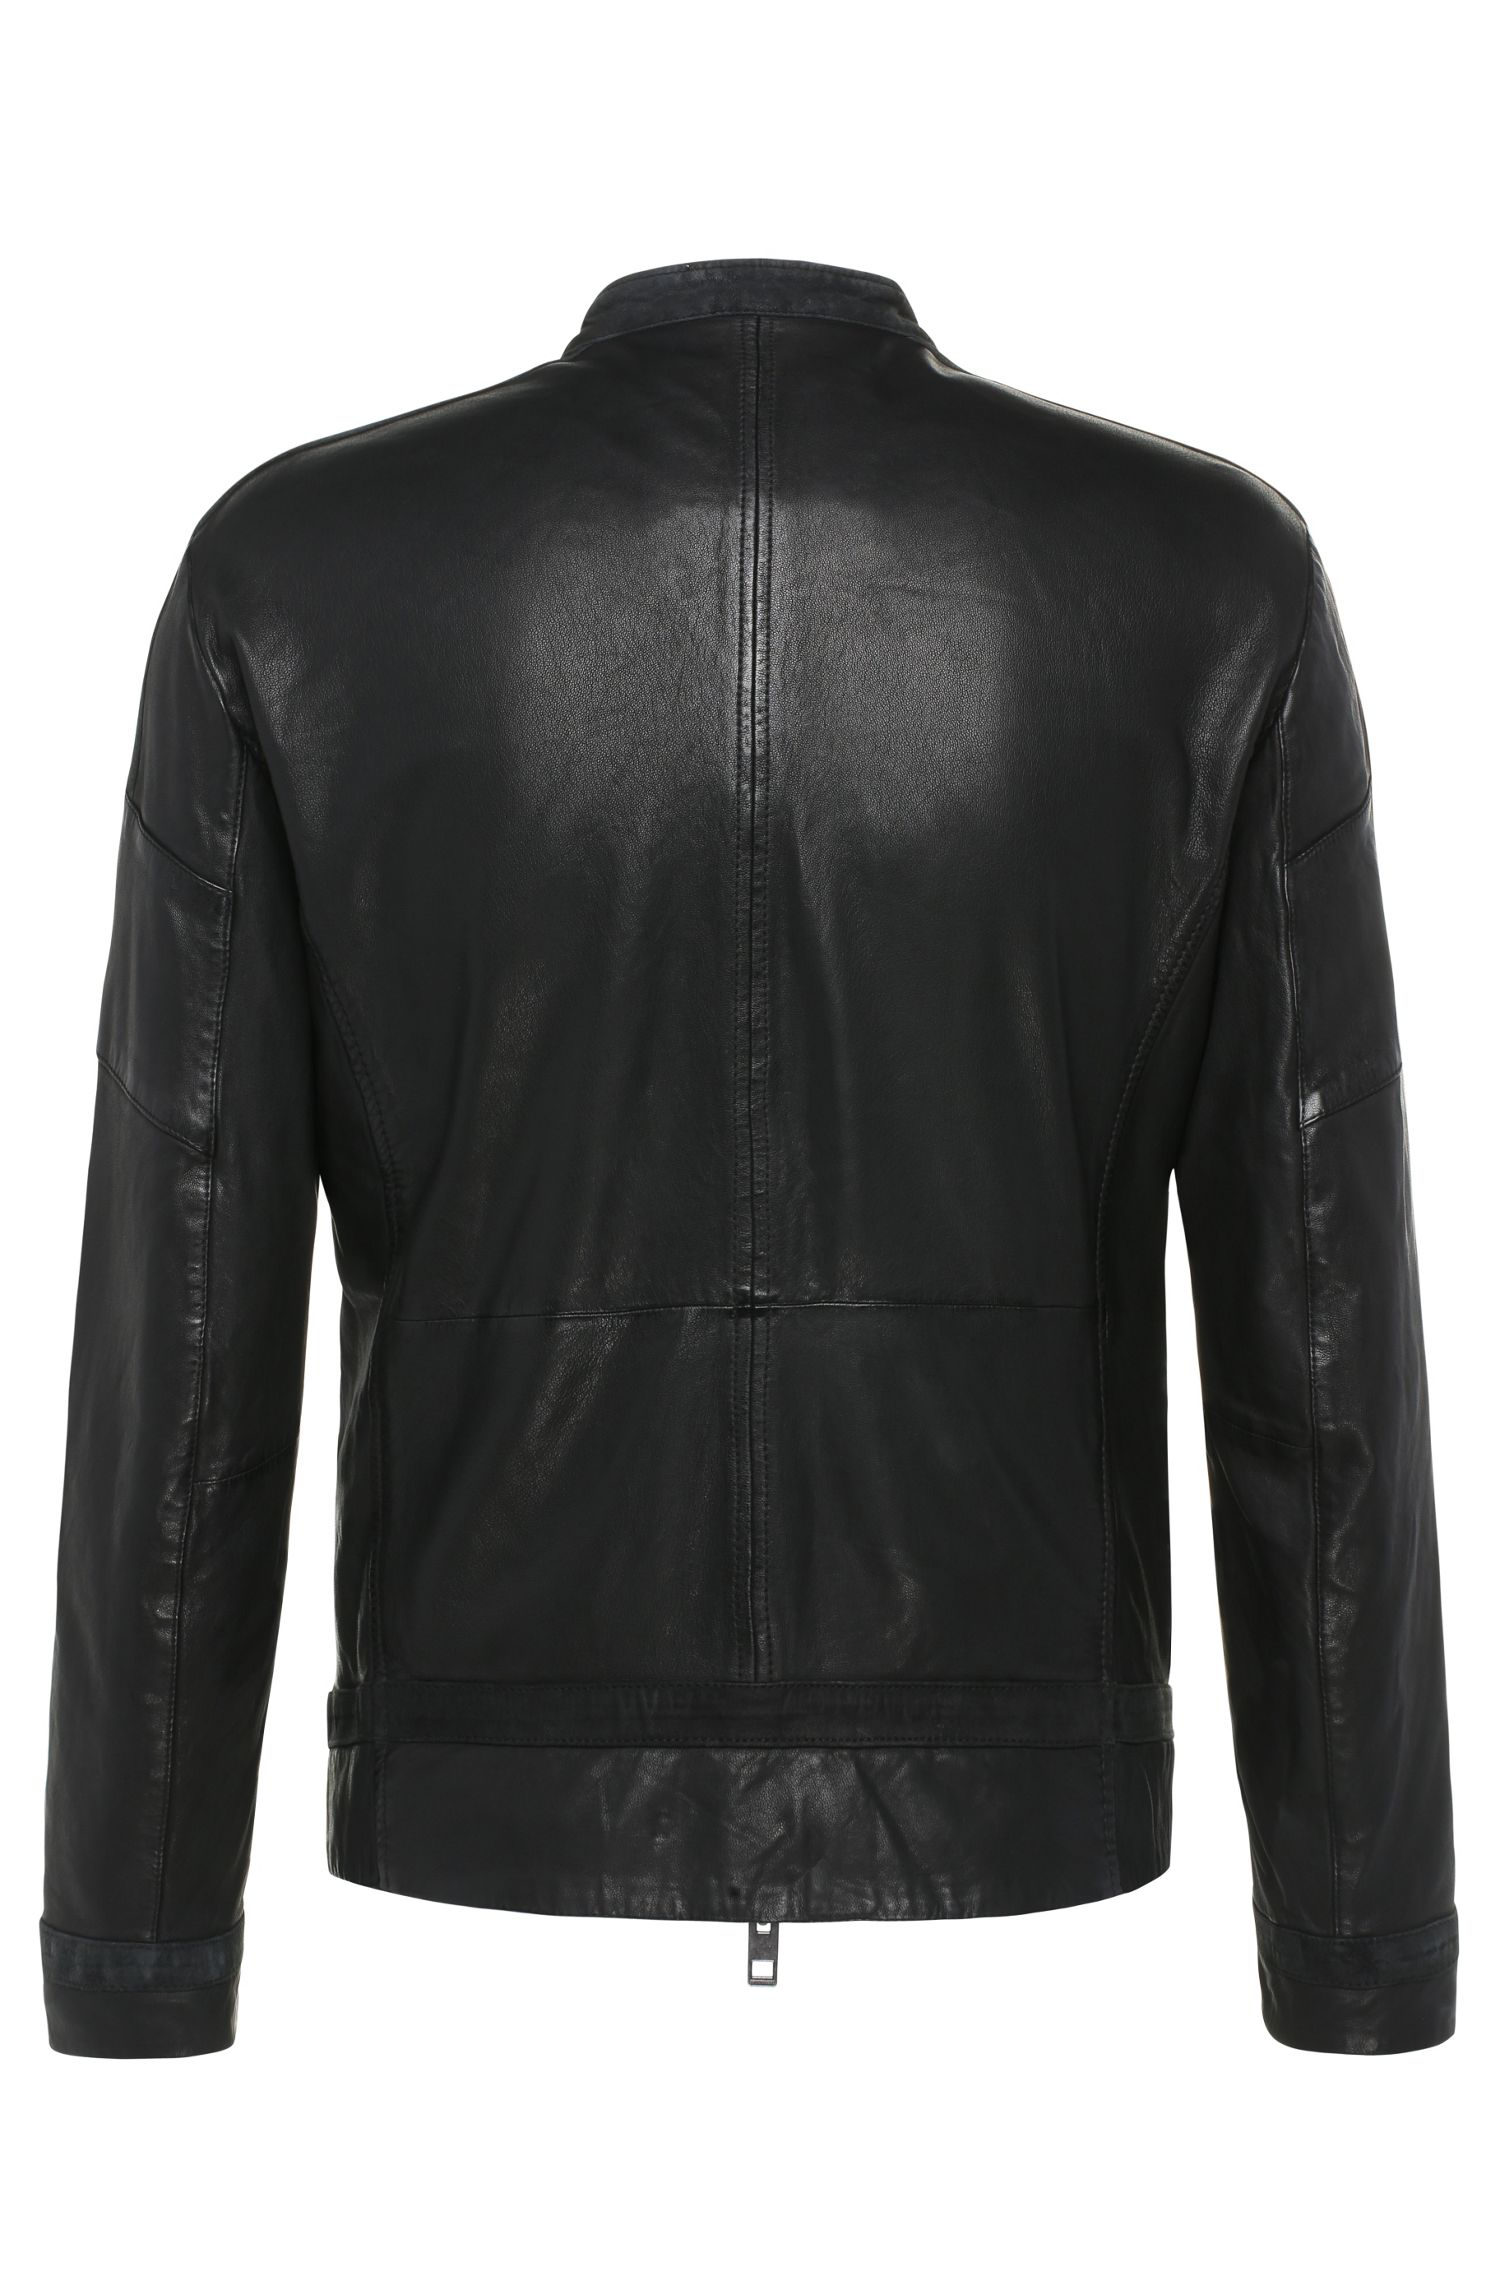 Sheepskin Paneled Biker Jacket | Jondro, Black